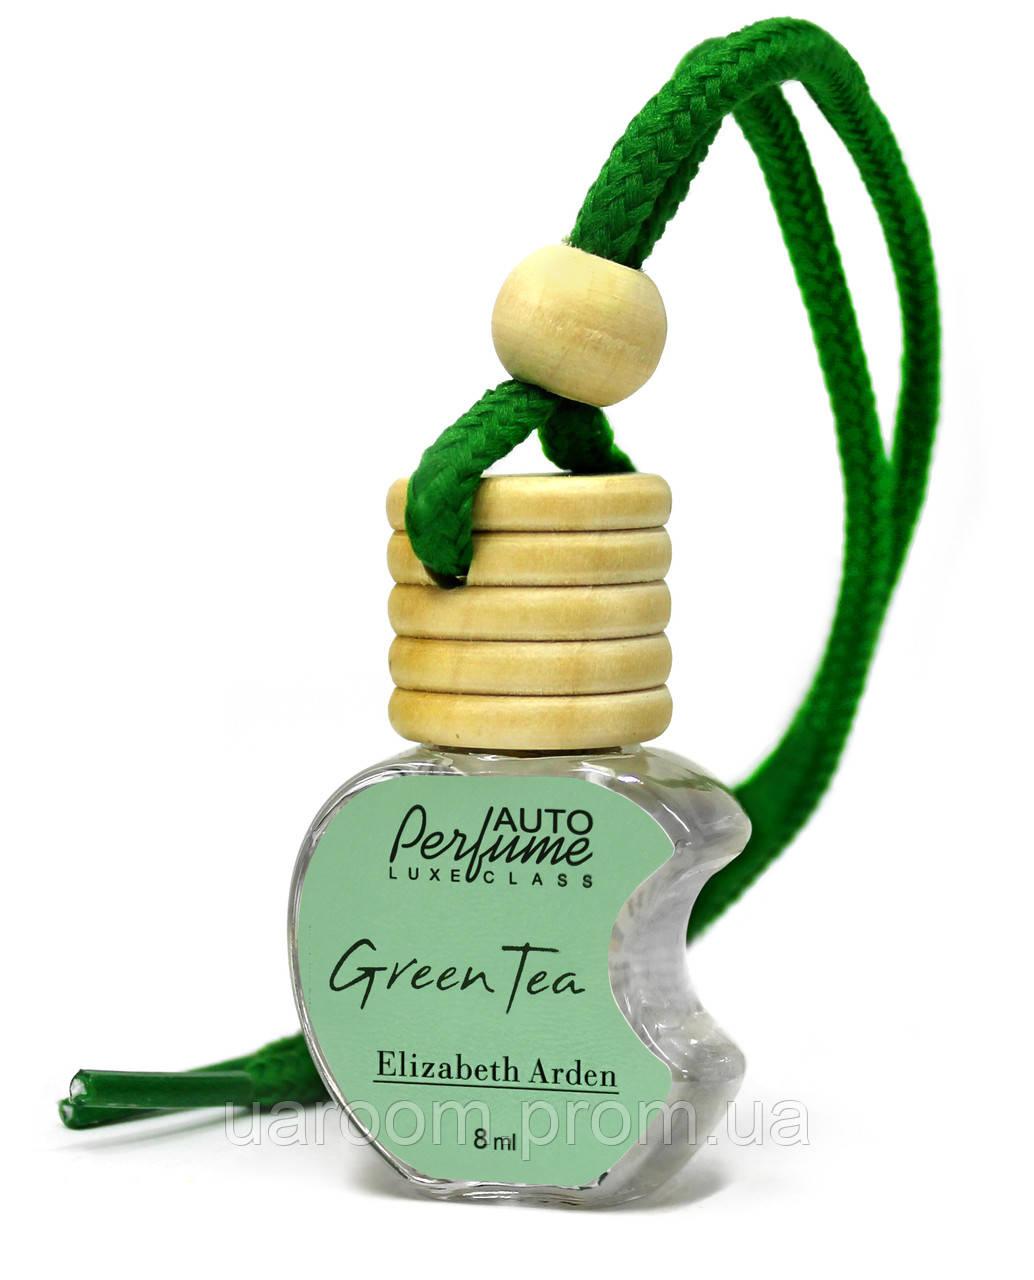 Ароматизатор LUXE CLASS Elizabeth Arden Green Tea